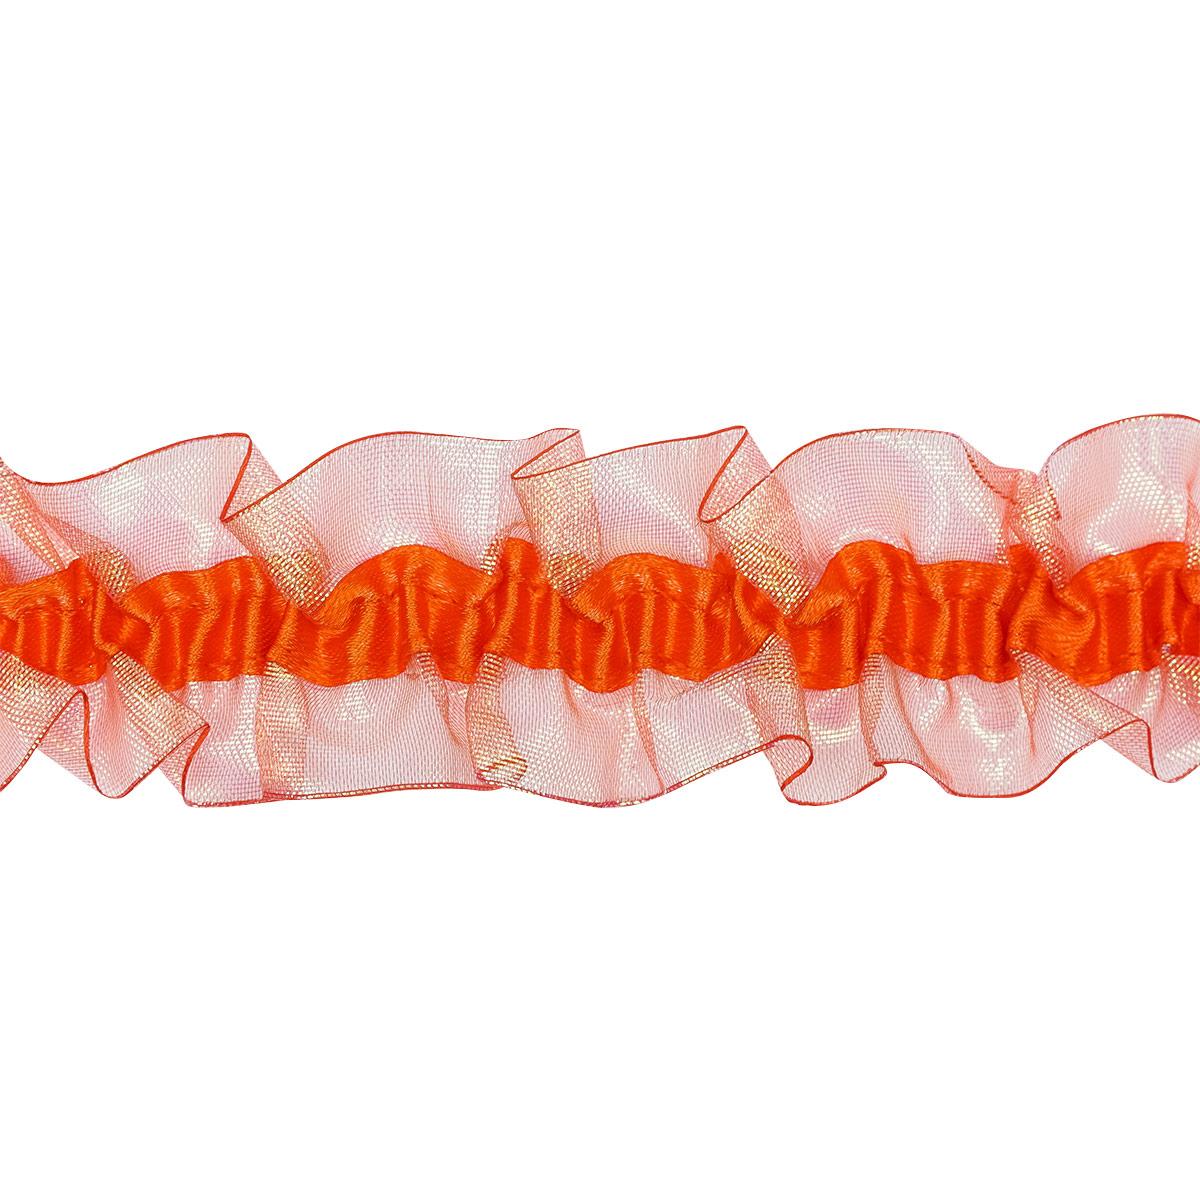 1AS-107 Тесьма-рюш эластичная двухсторонняя 40мм*9,14м